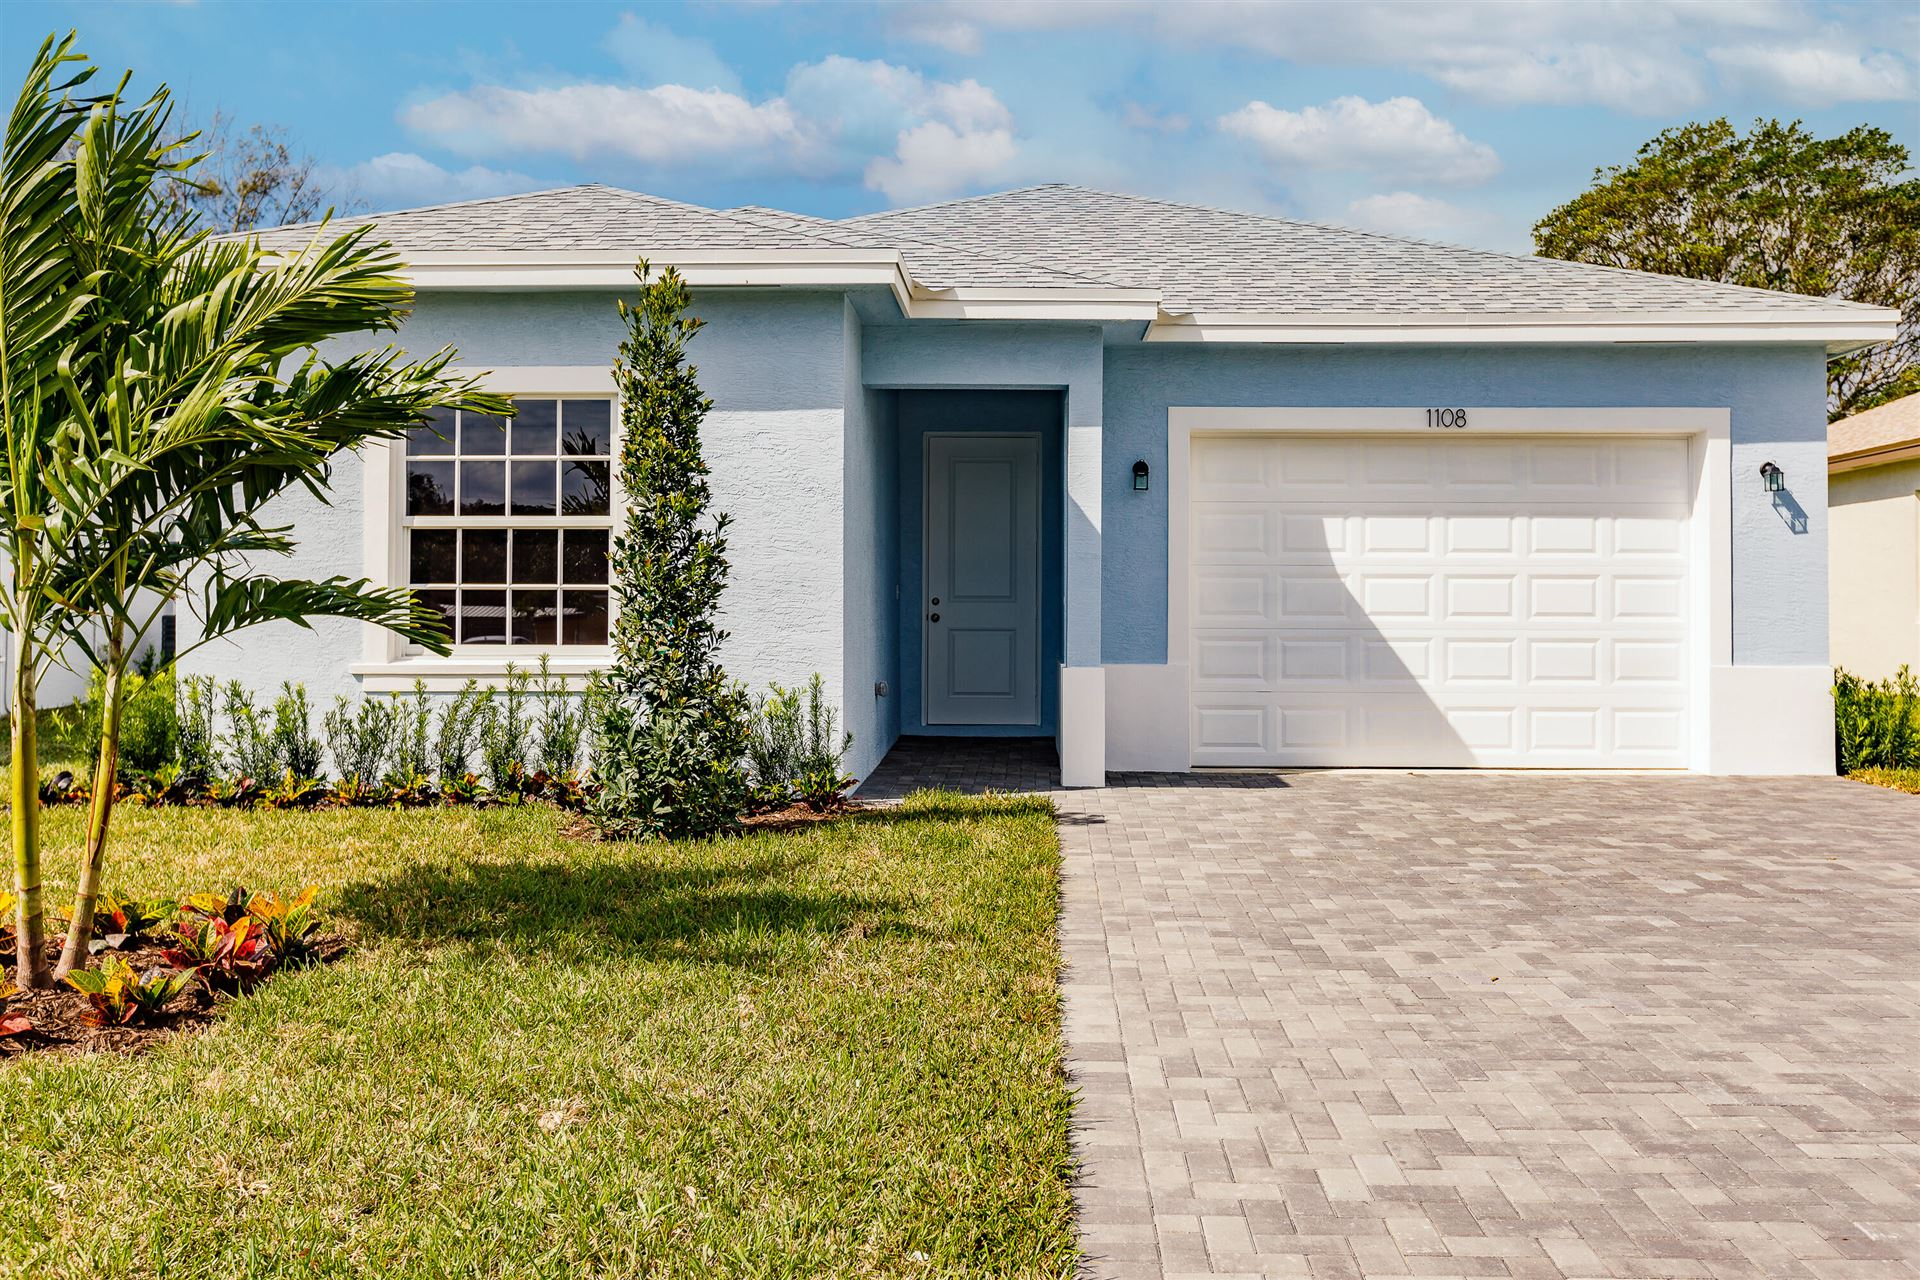 Photo of 1108 SW 7th Avenue, Delray Beach, FL 33444 (MLS # RX-10695104)